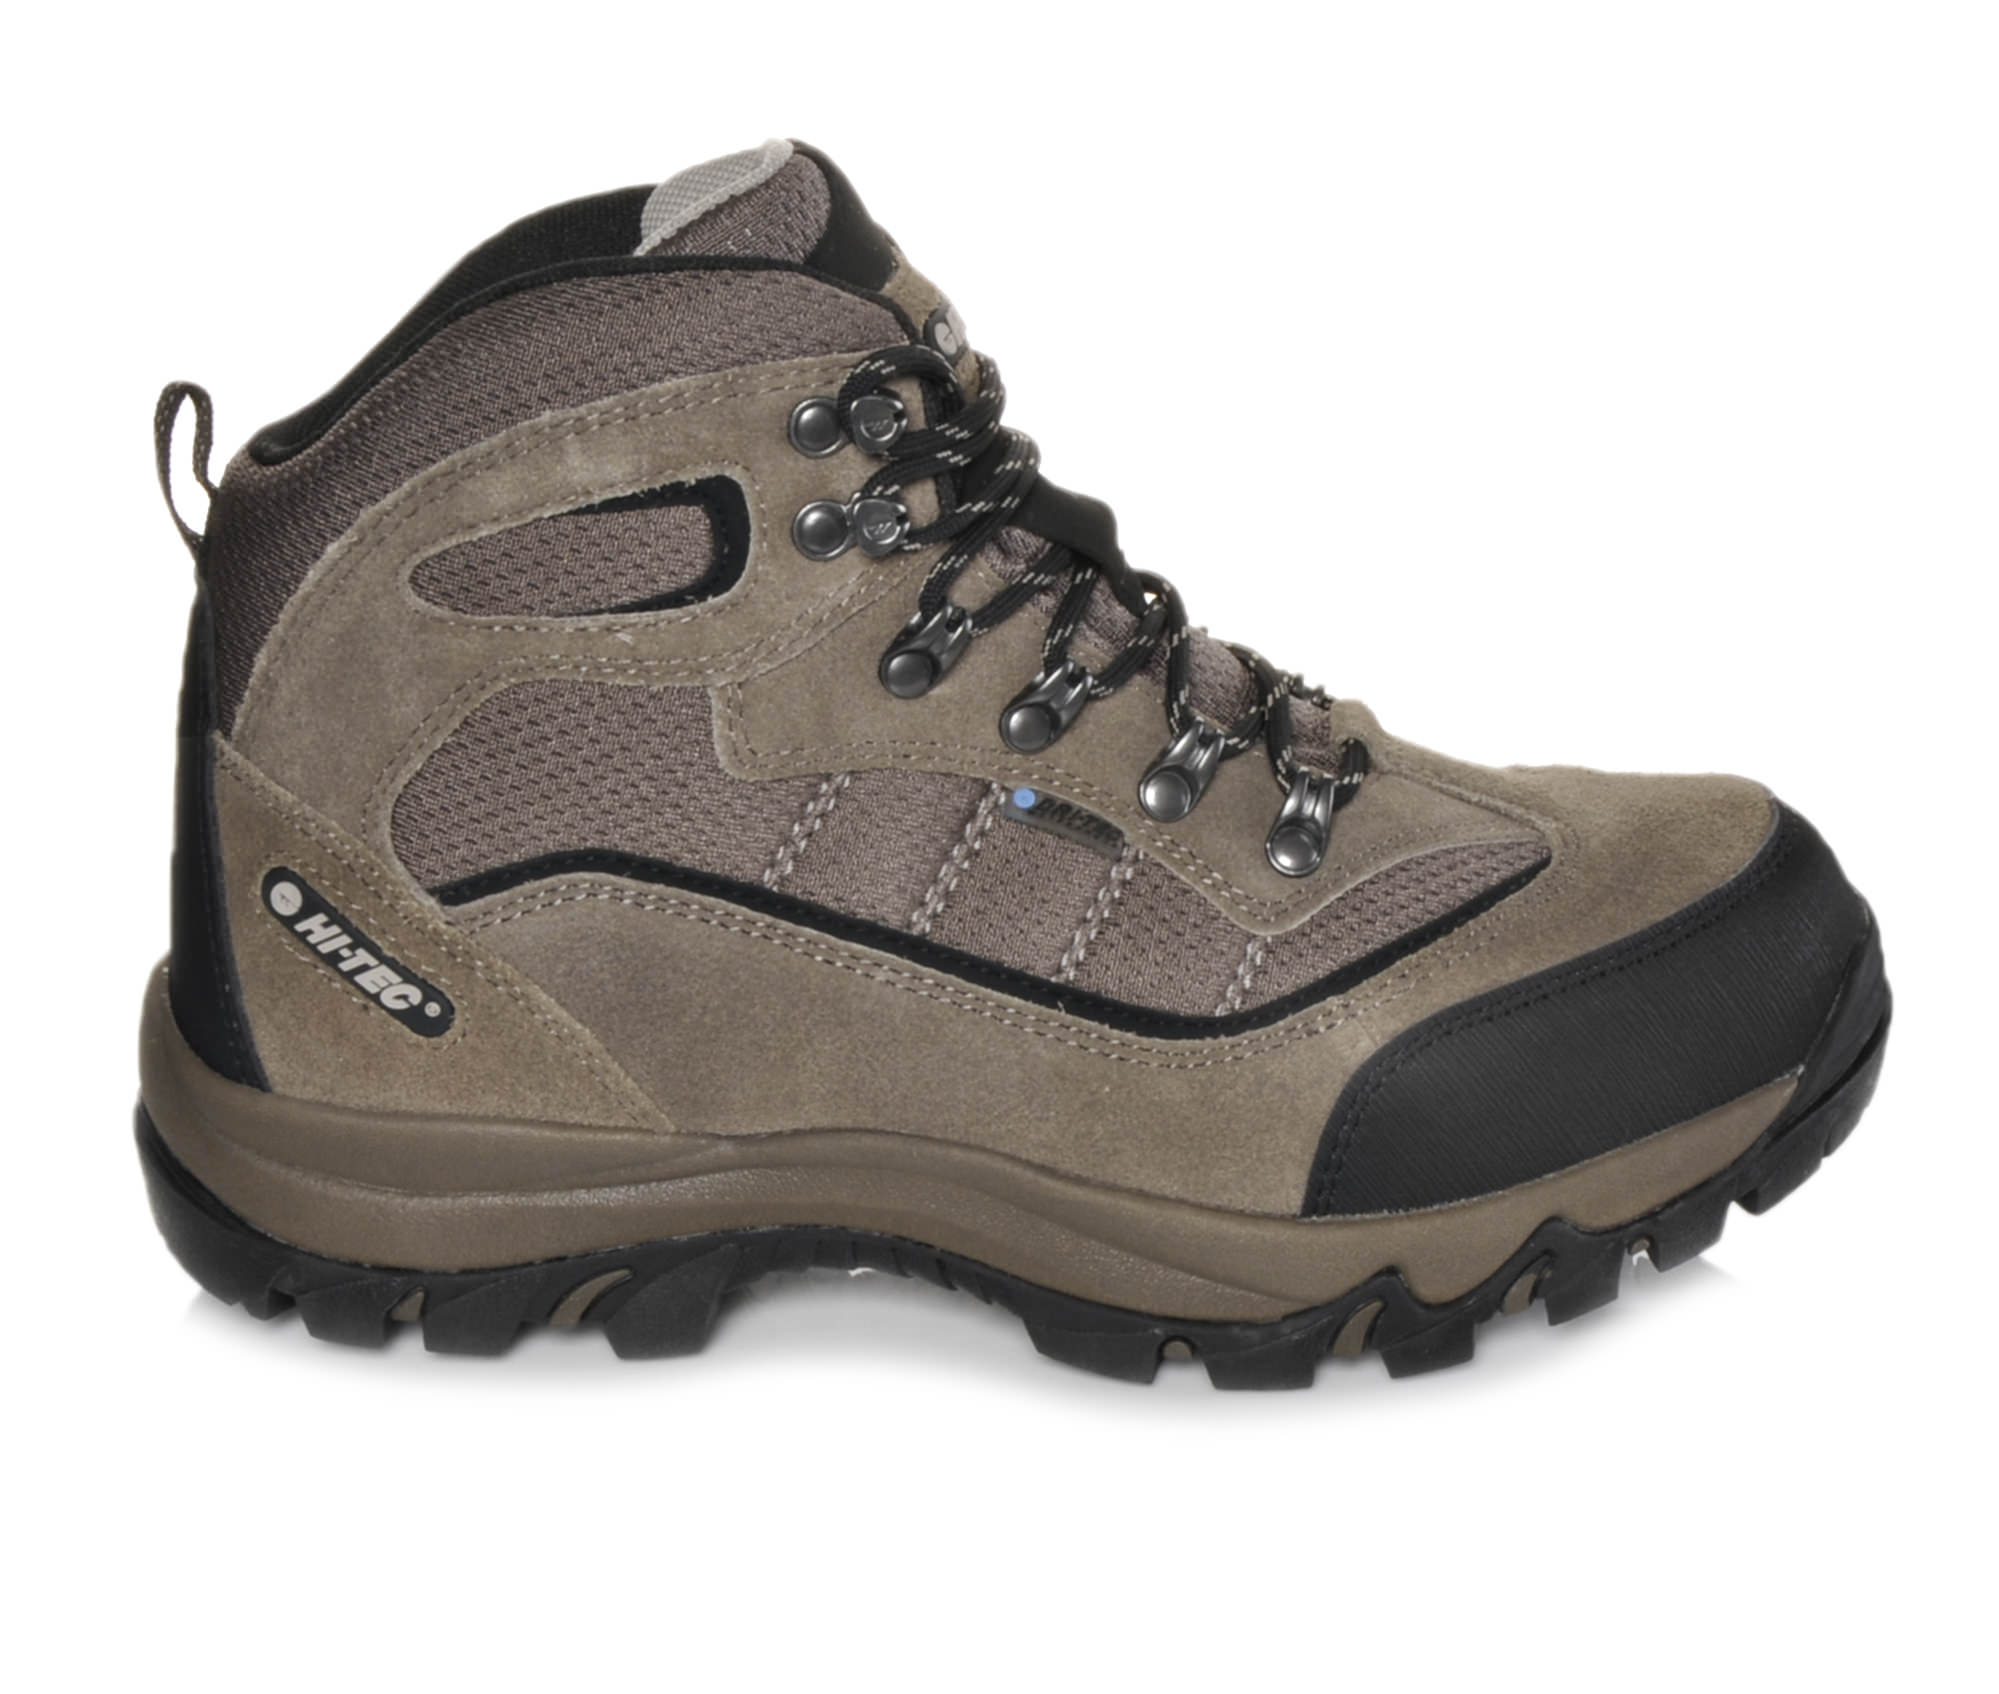 Hi-Tec Skamania Waterproof Hiking Boots